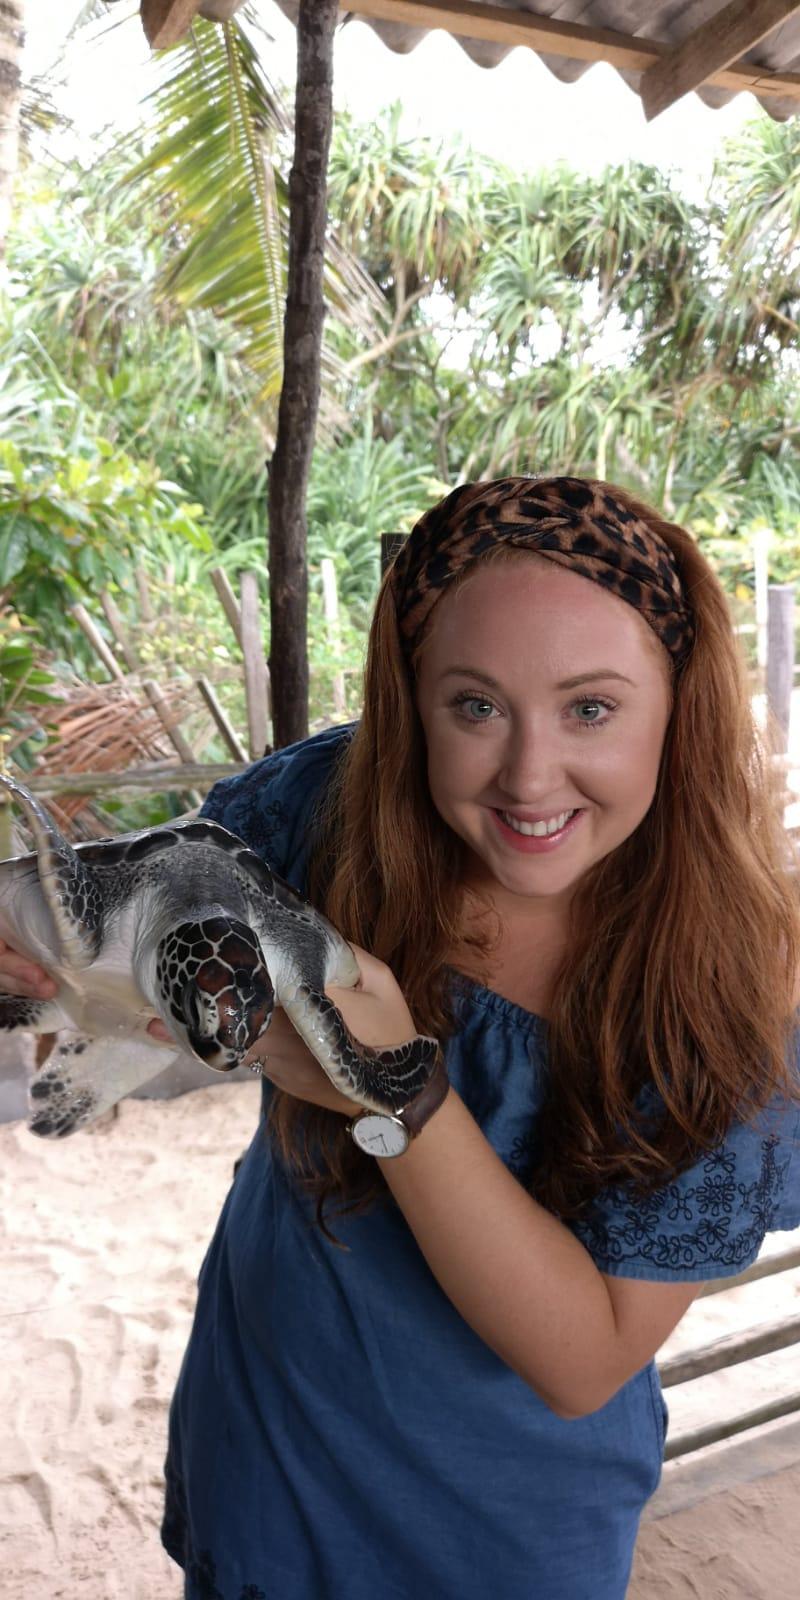 invite-to-paradise-sri-lanka-holiday-honeymoon-specialists-customer-feedback-elin-jordan-luce-sea-turtle-hatchery-hold.JPG